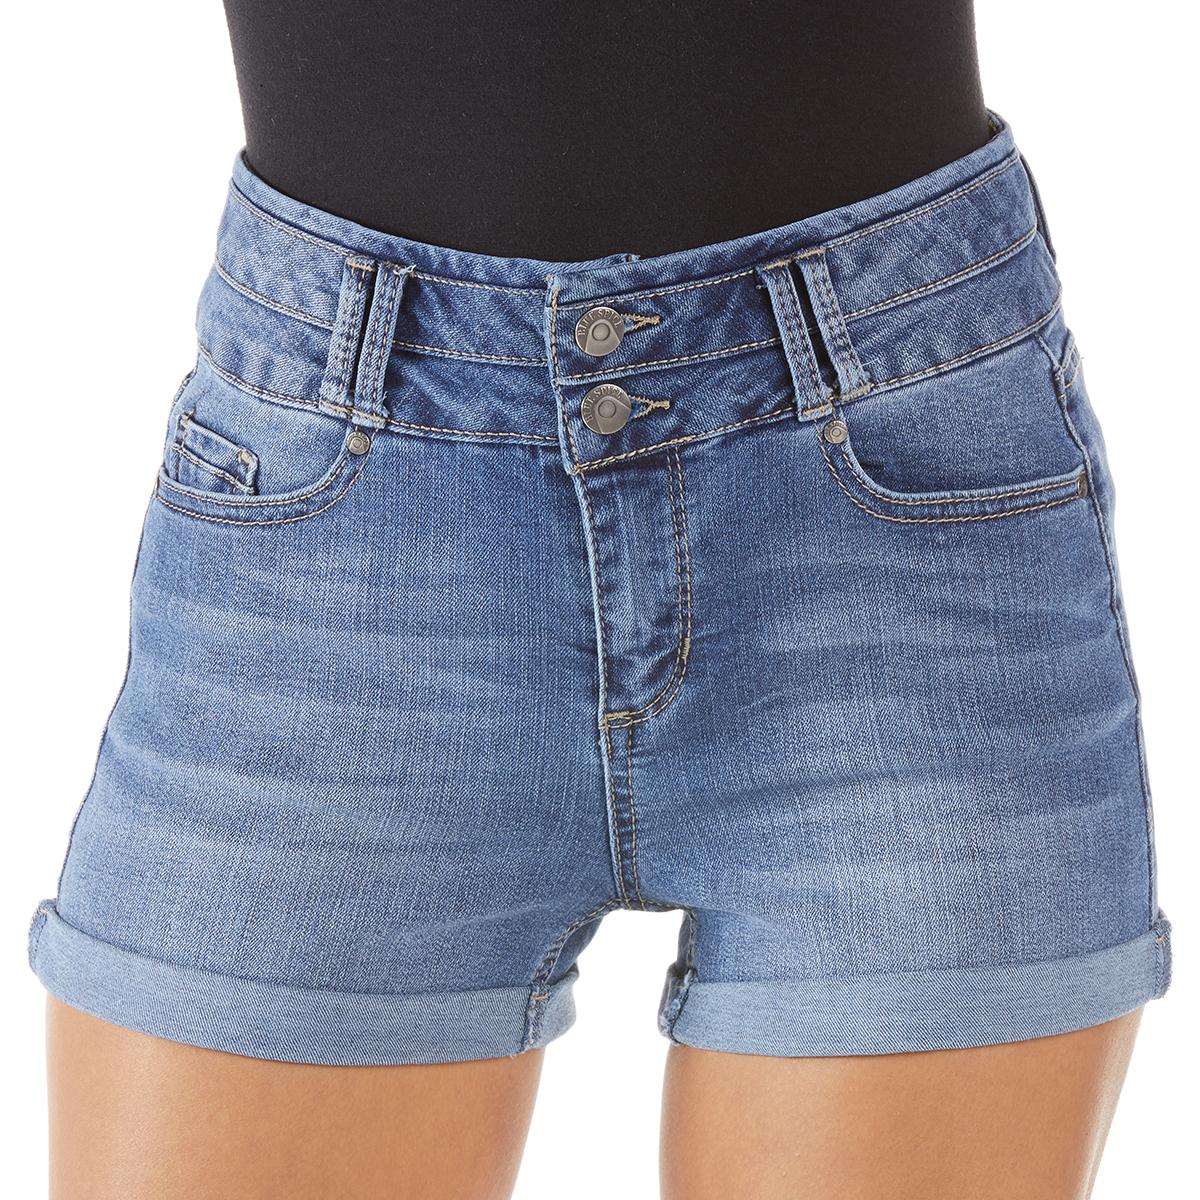 Blue Spice Juniors' Denim High Rise Shorts